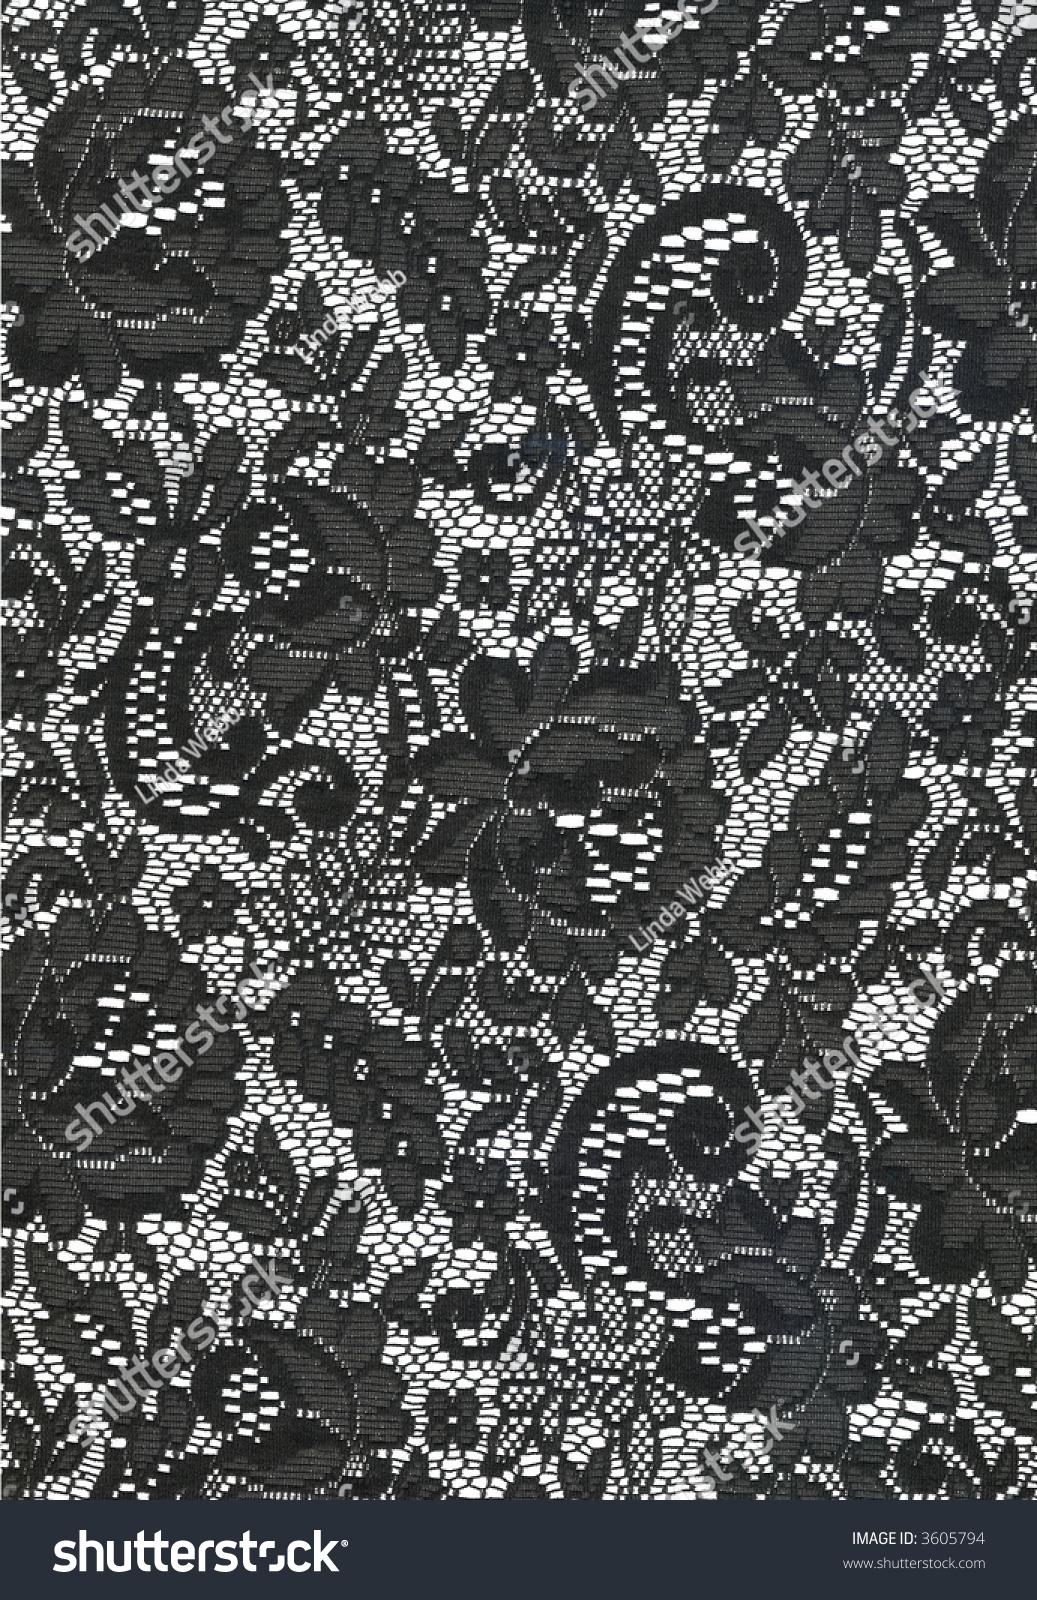 black white lace texture stock photo 3605794 shutterstock